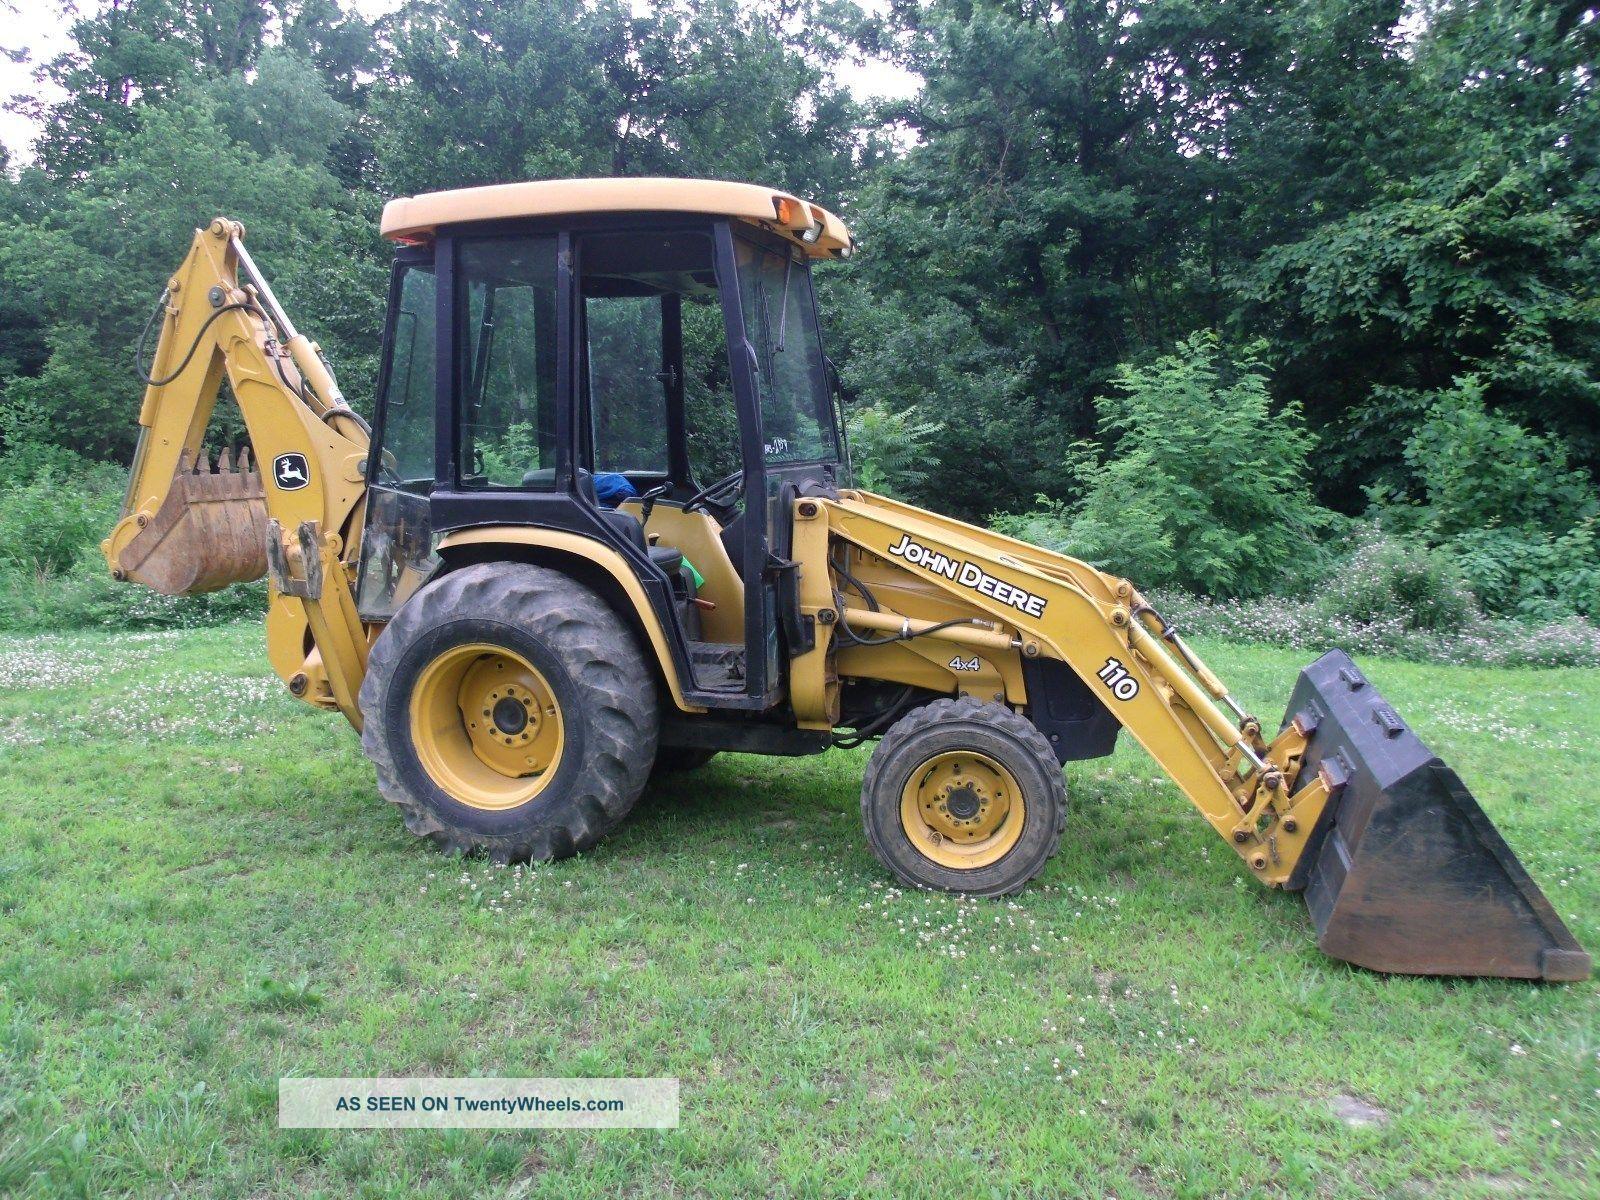 John Deere 110 Backhoe : John deere loader tractor backhoe full cab diesel